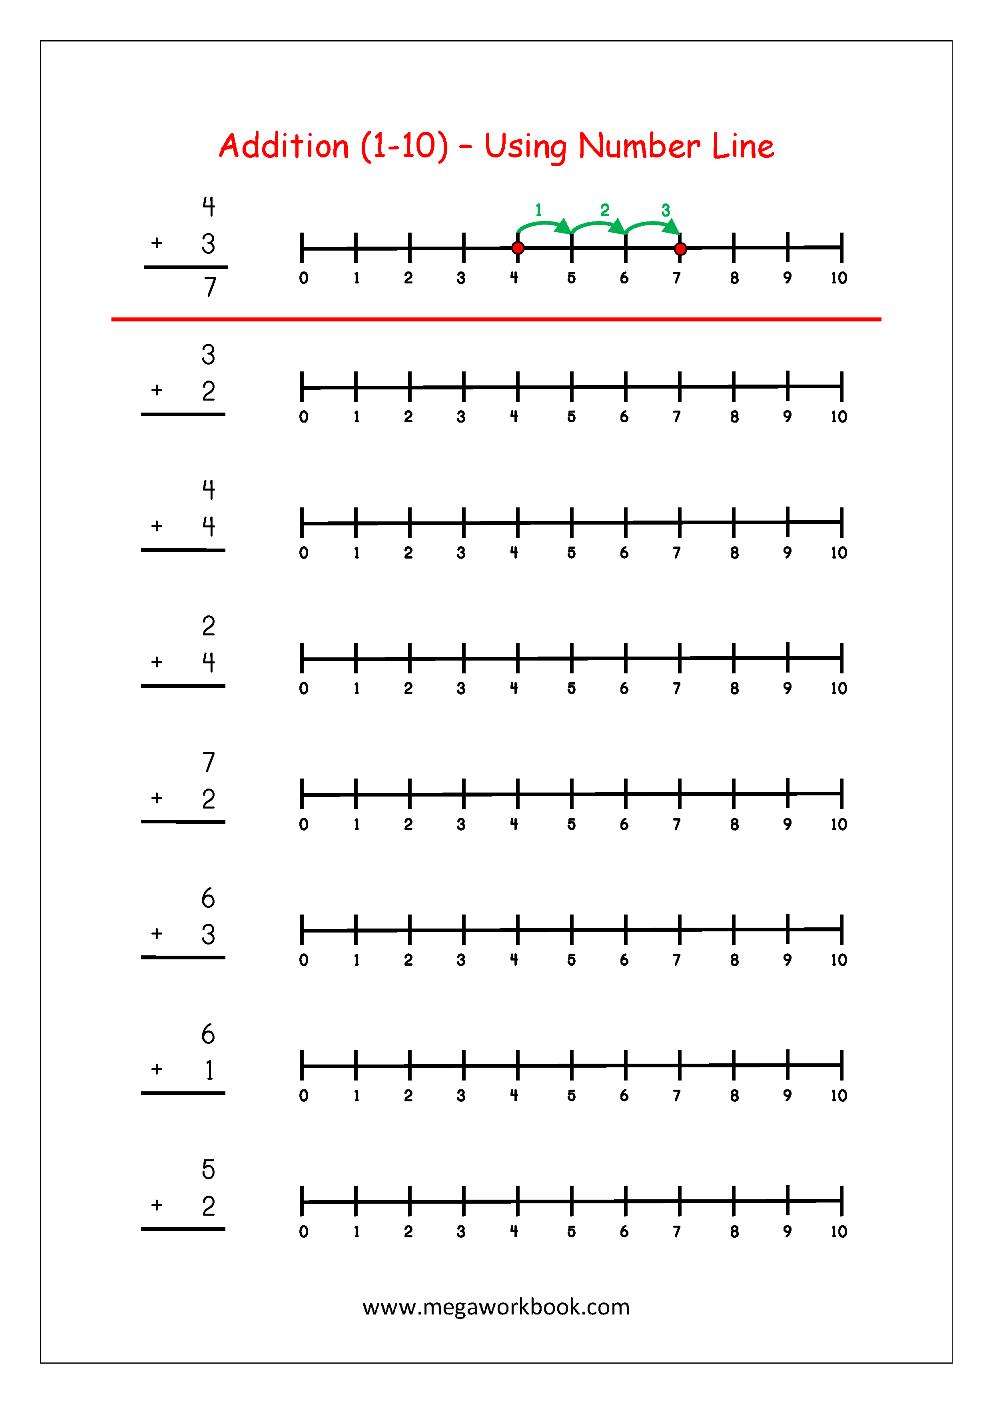 Free Printable Number Addition Worksheets (1-10) For Kindergarten - Free Printable Number Line 0 20